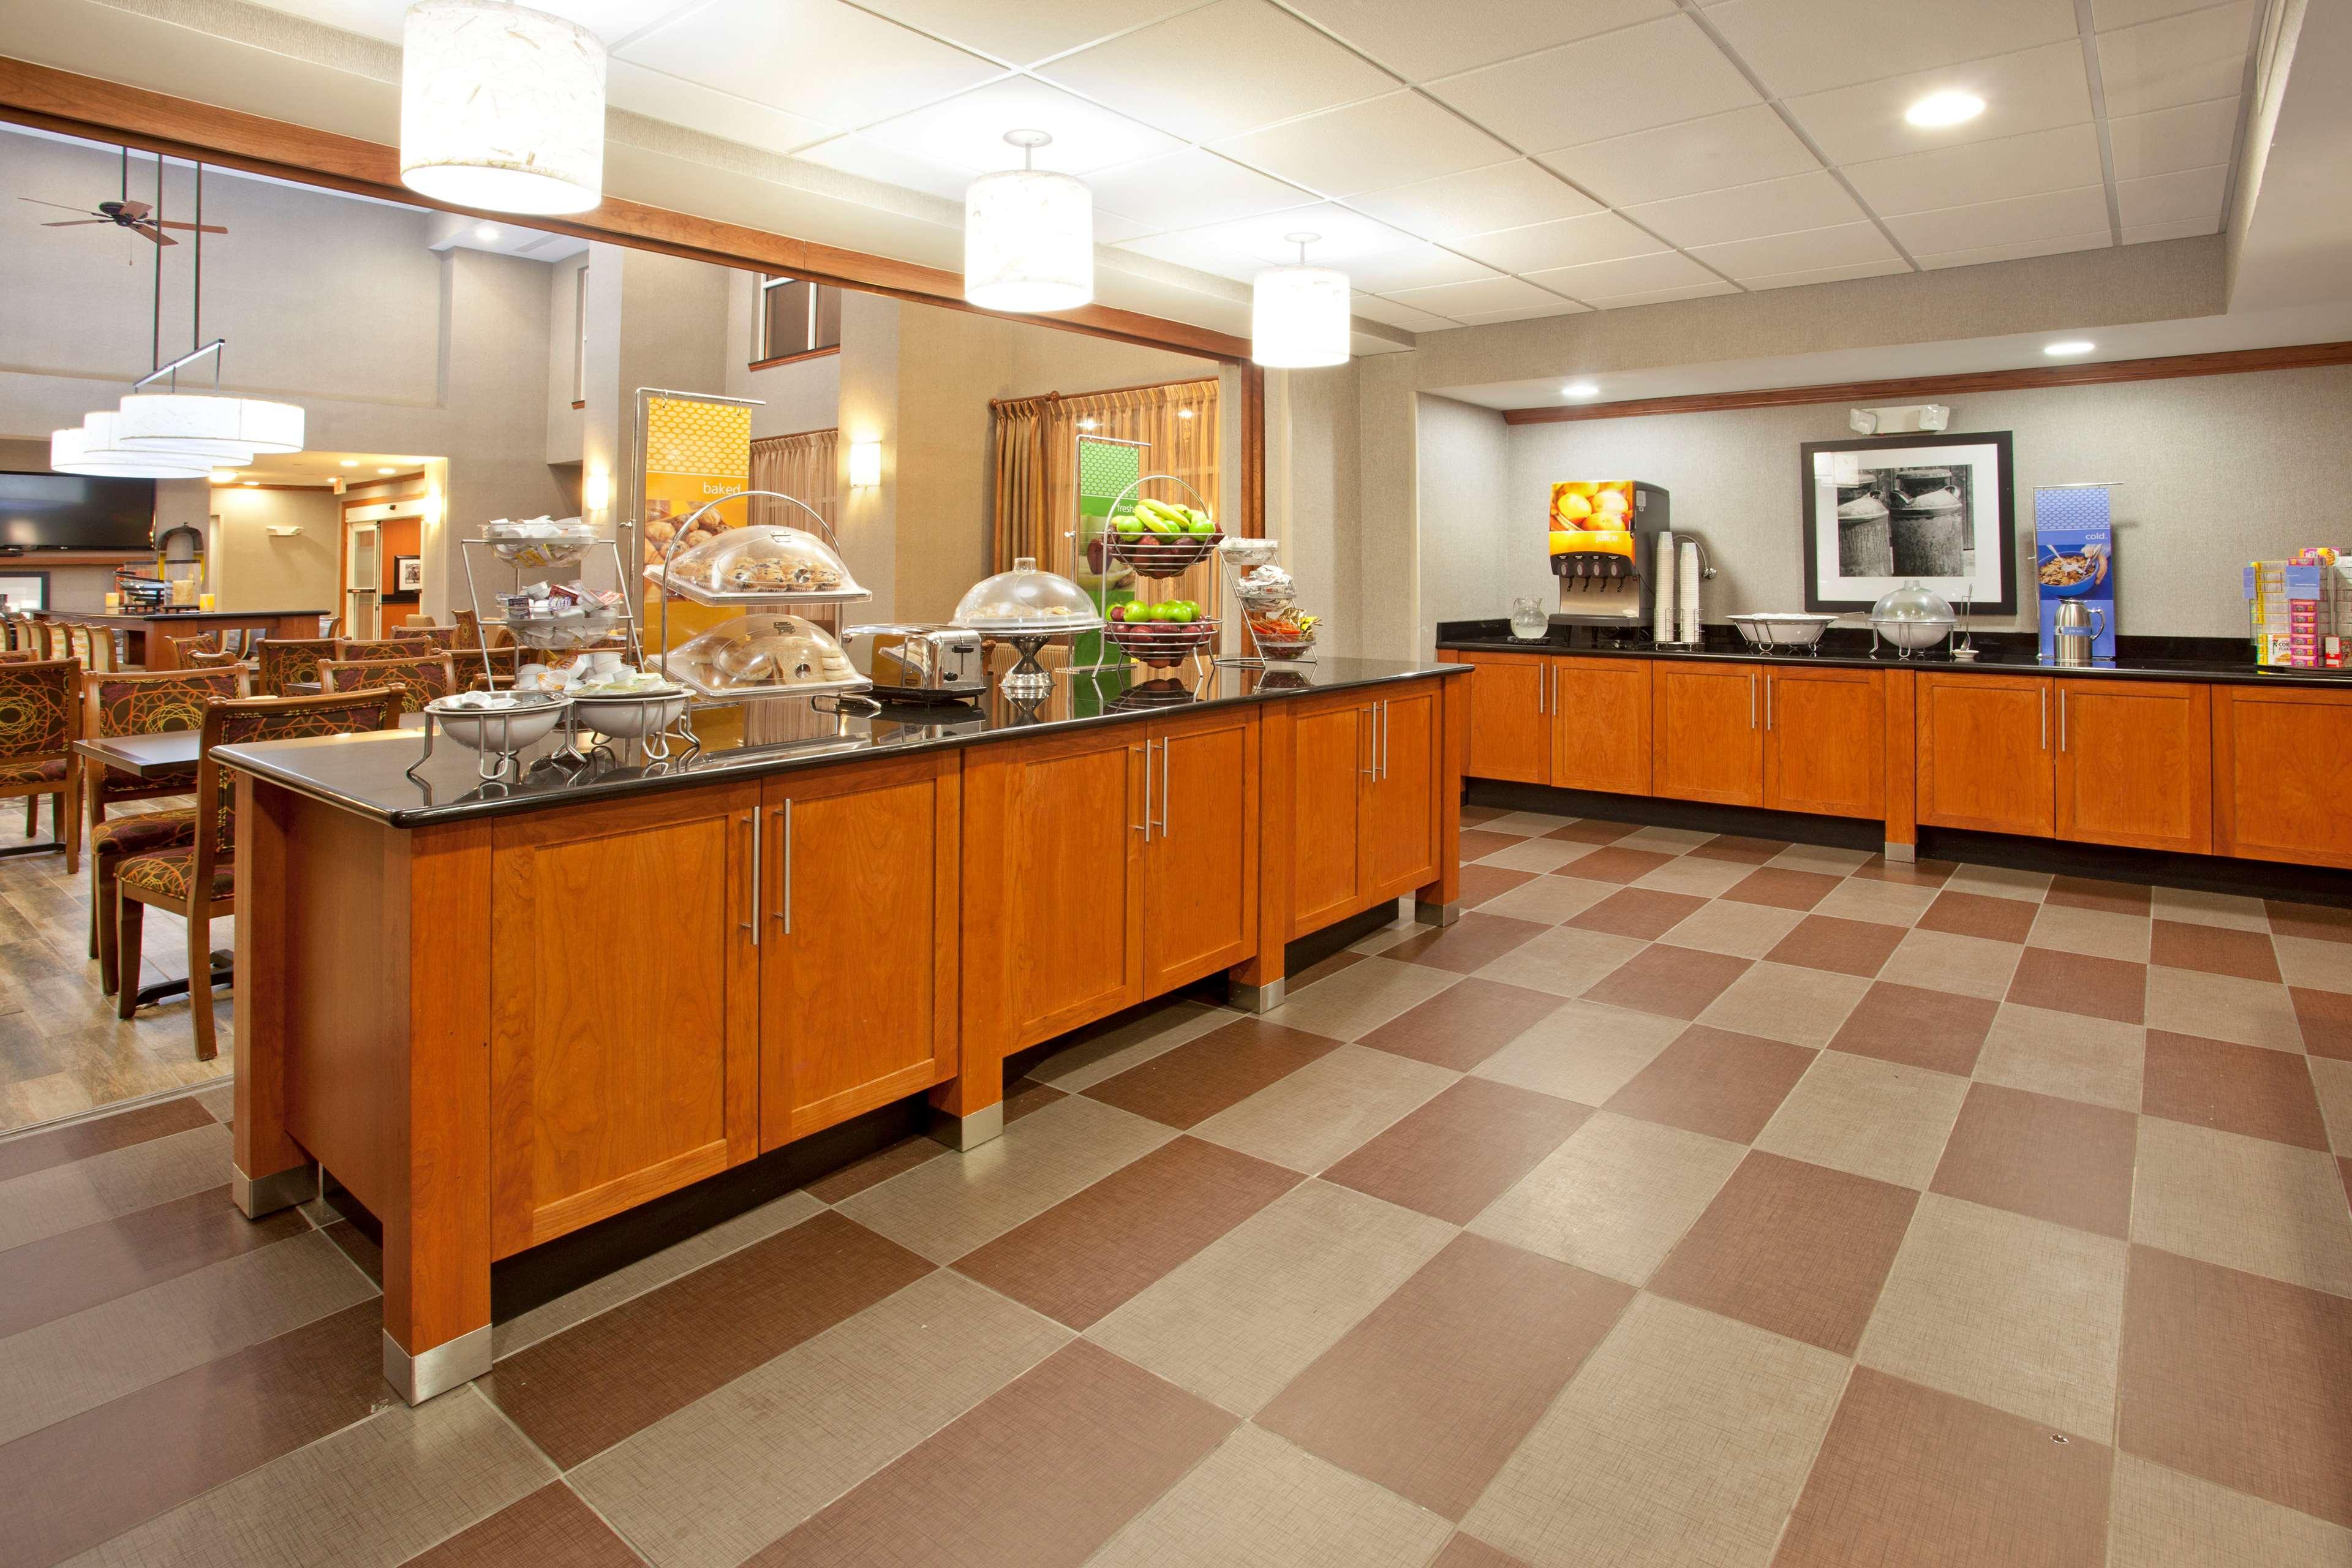 Hampton Inn & Suites Fort Worth-West-I-30 image 9